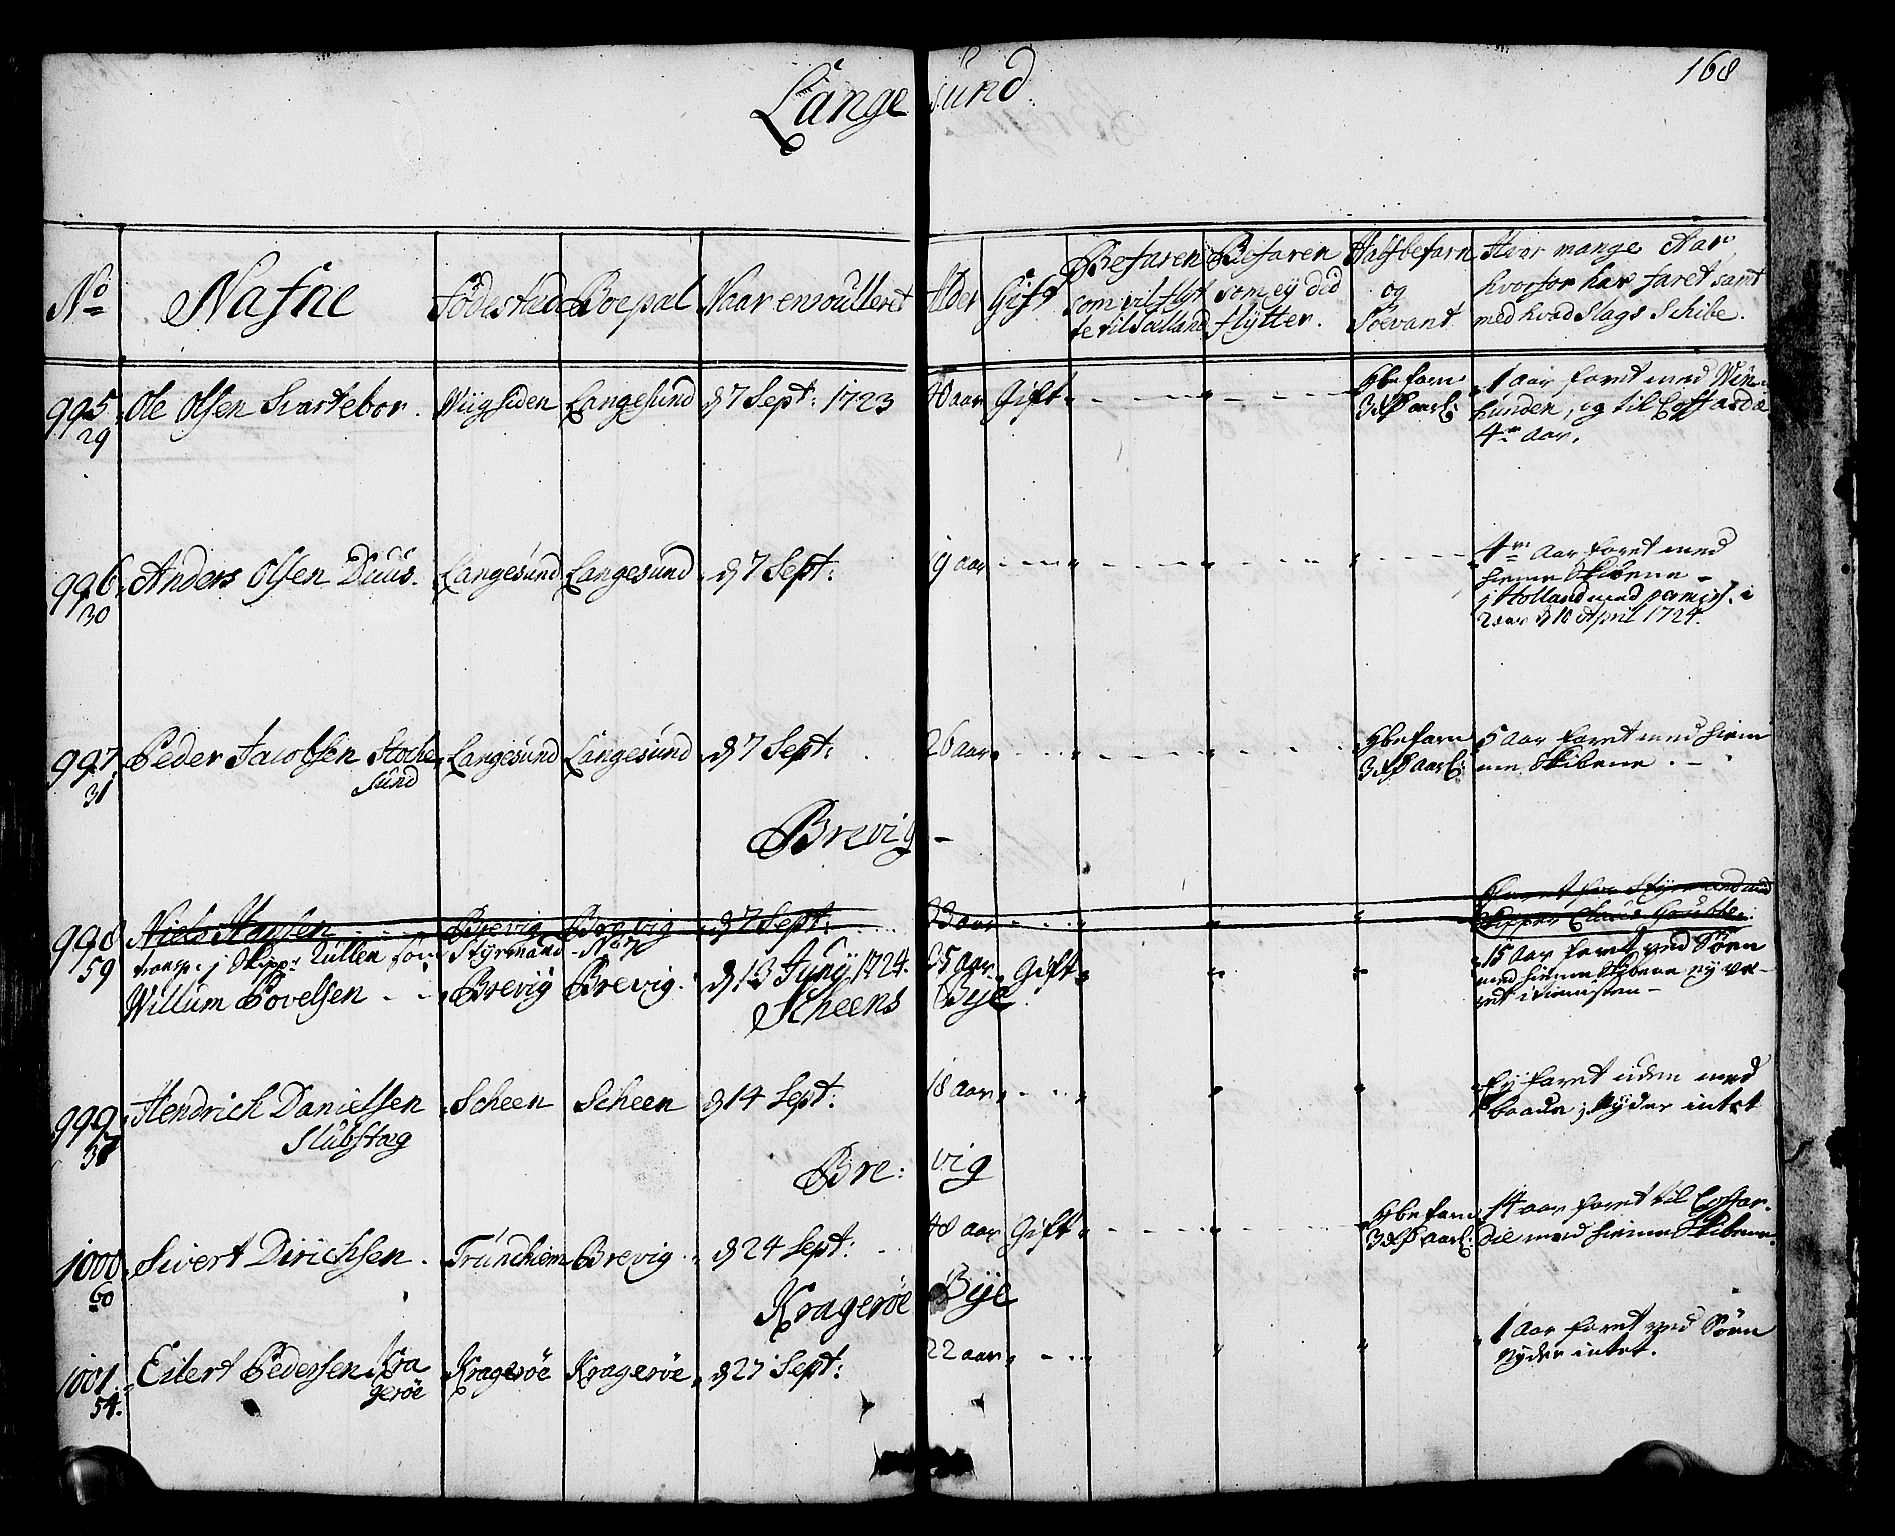 SAKO, Drammen innrulleringsdistrikt, F/Fa/L0002: Hovedrulle, 1723-1726, s. 169